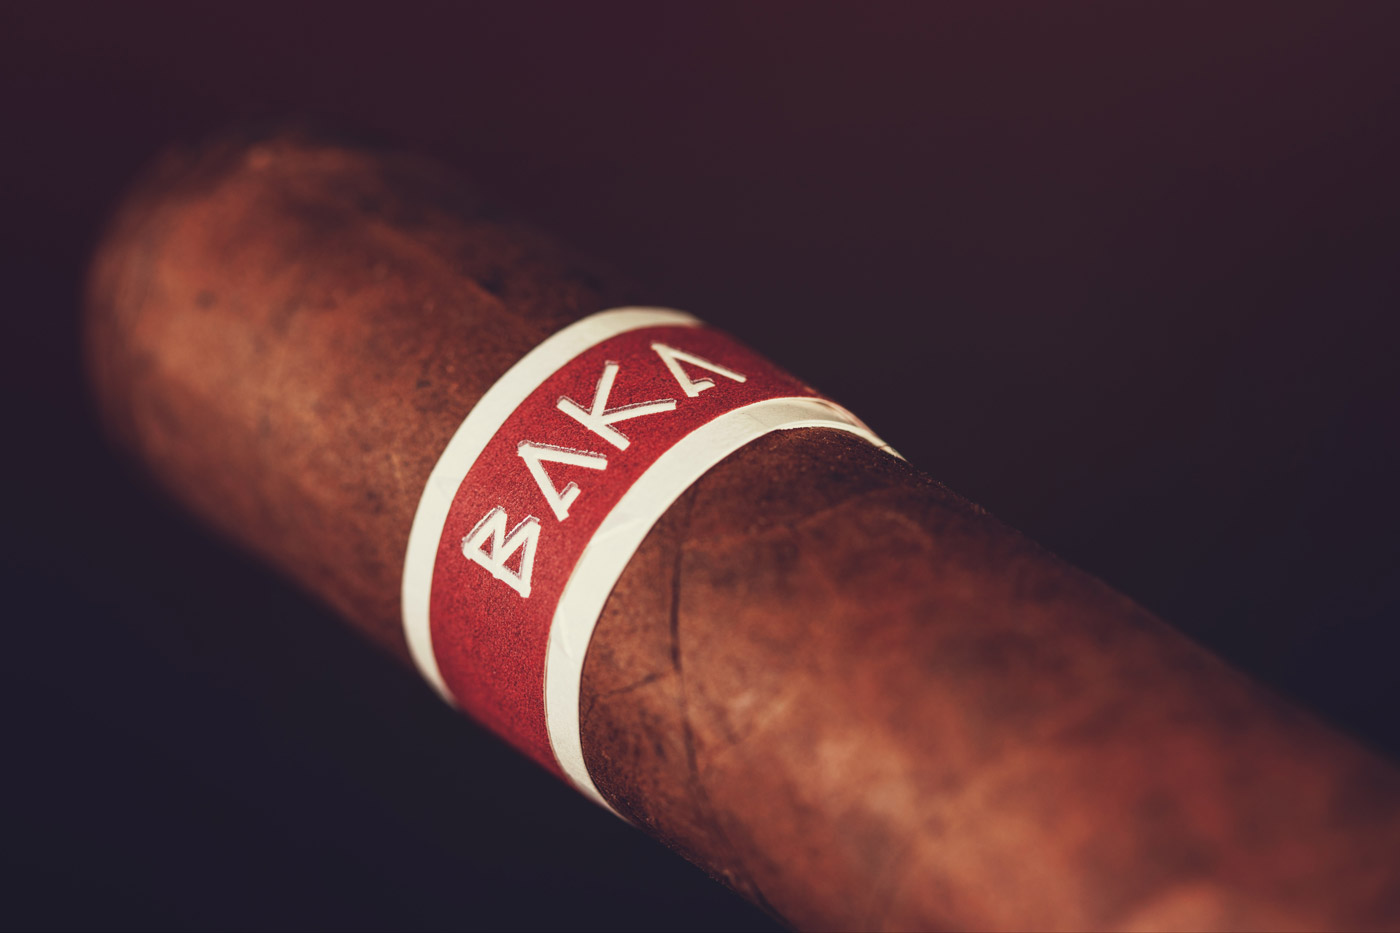 RoMa Craft Baka Bantu cigar review